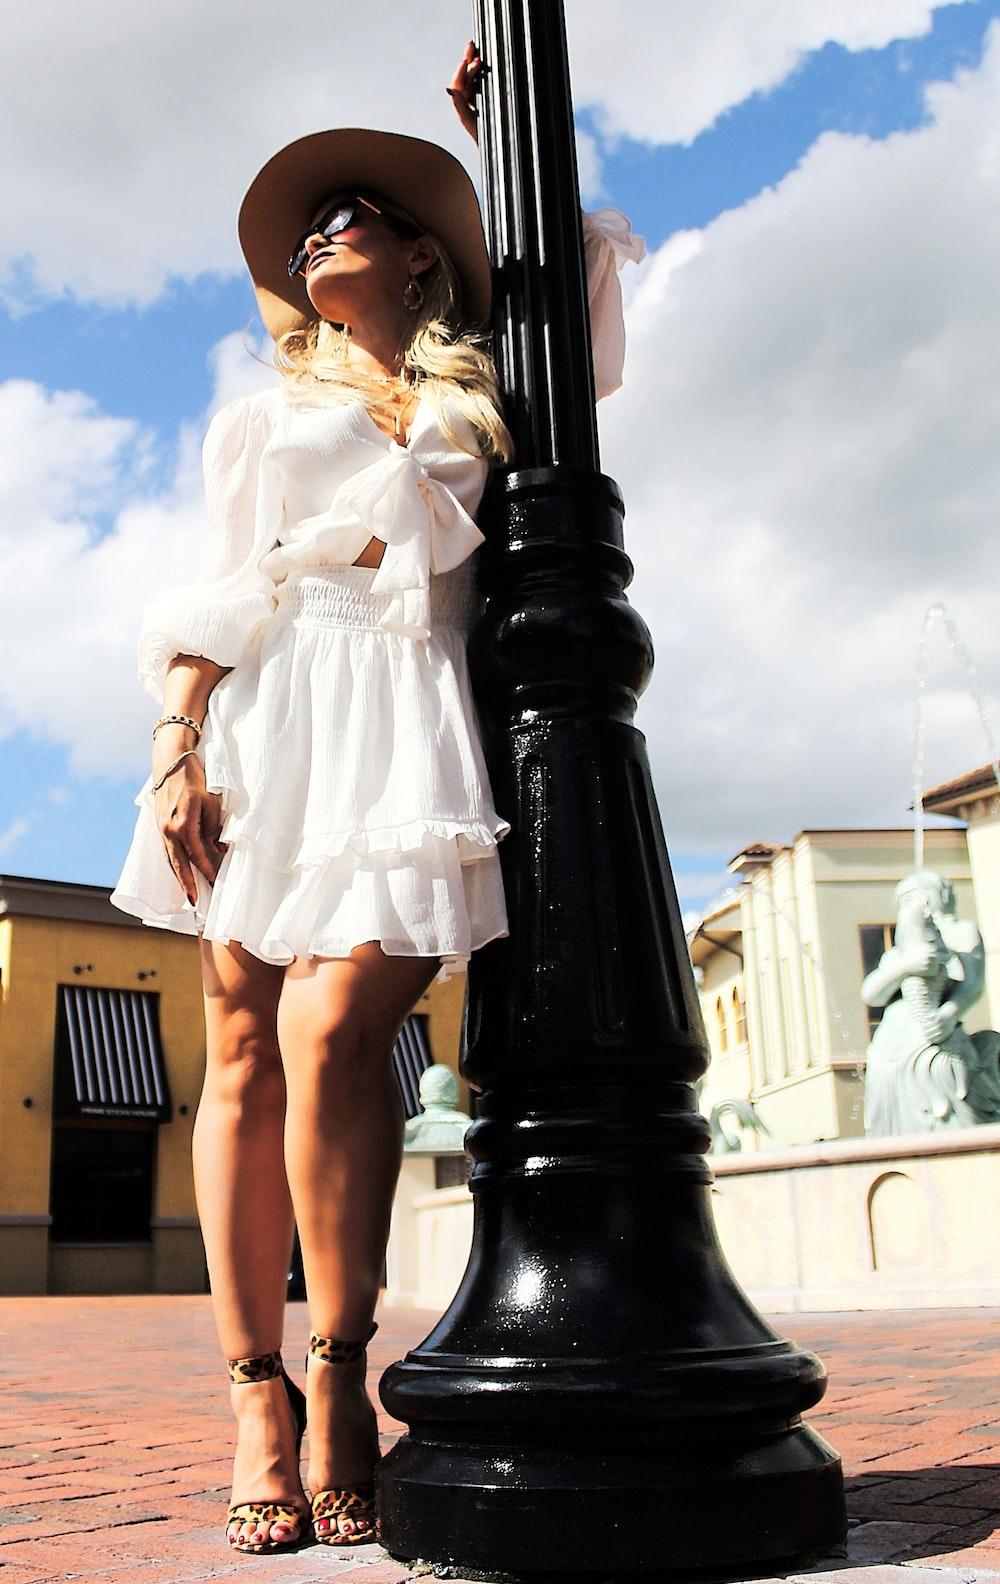 woman wearing white long-sleeved dress beside black post